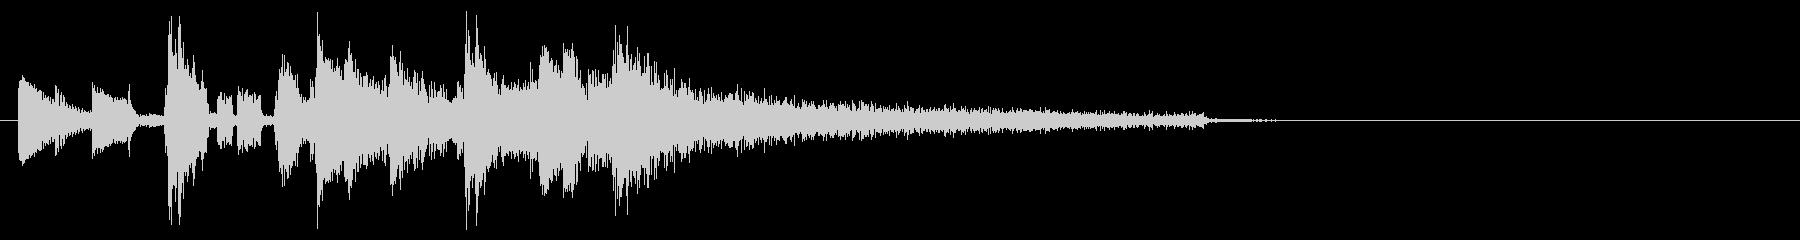 Urban jingle's unreproduced waveform